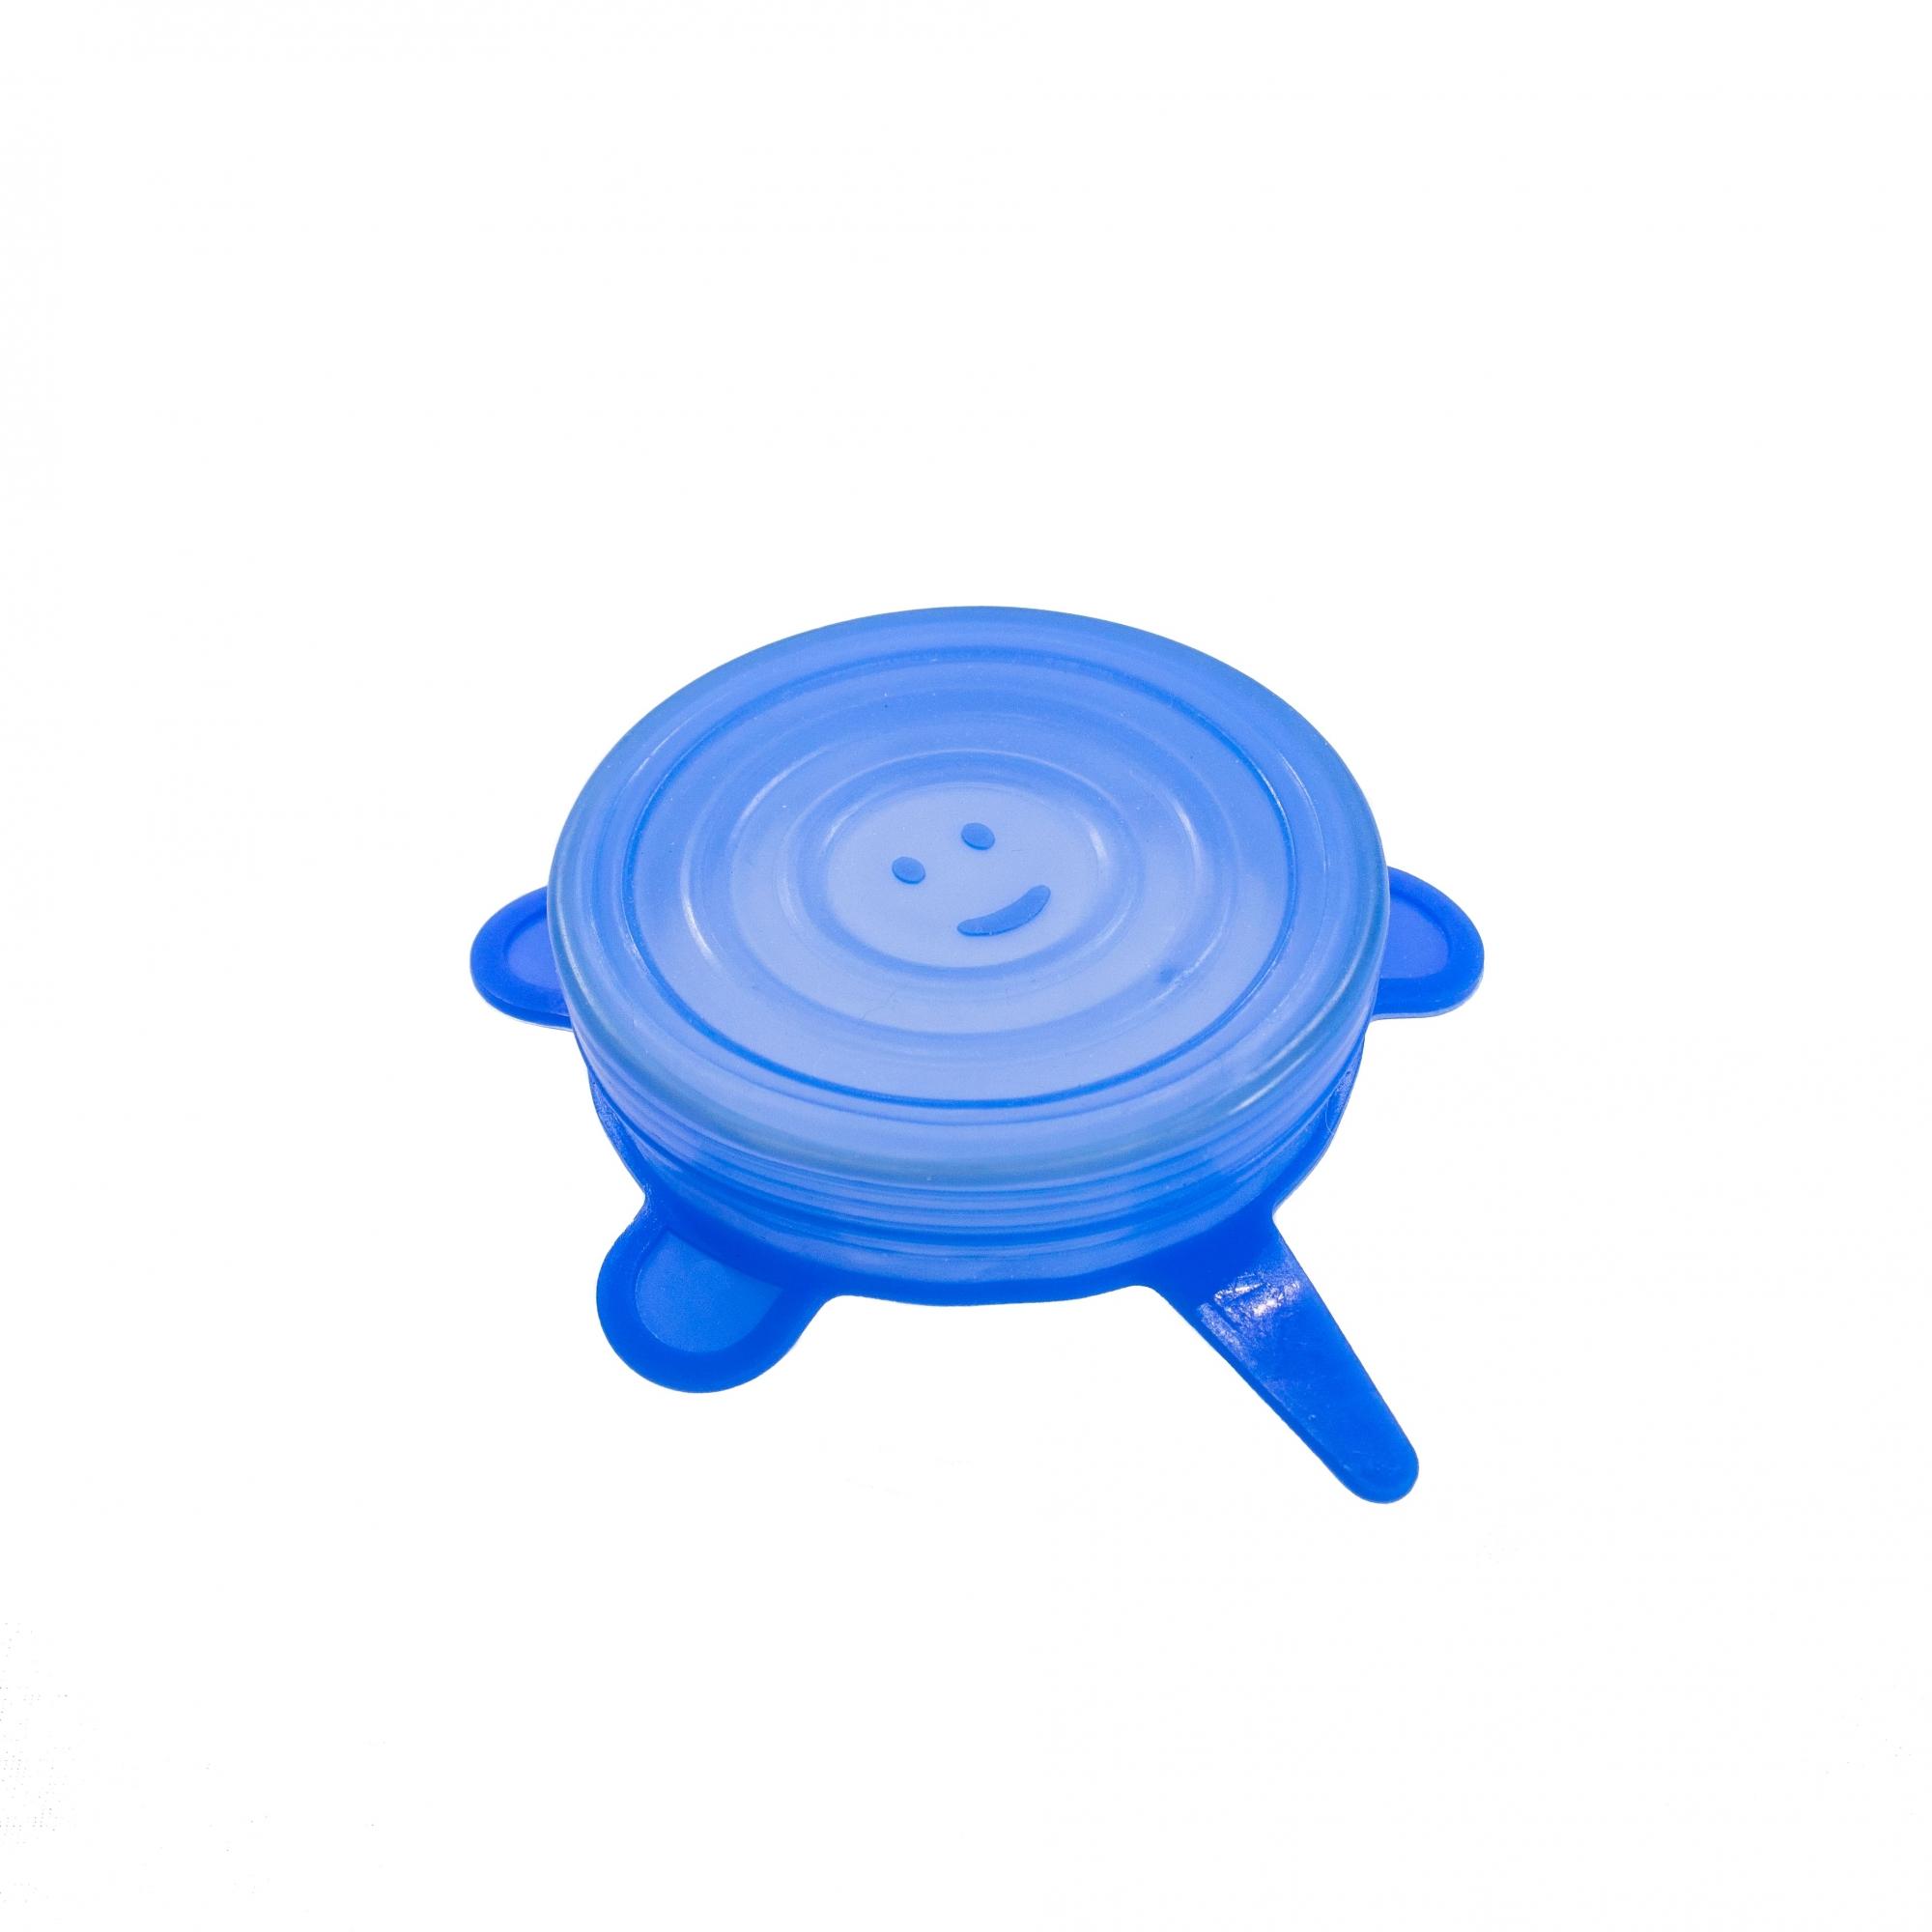 Kit de 6 Tampas de Silicone Universal Azul